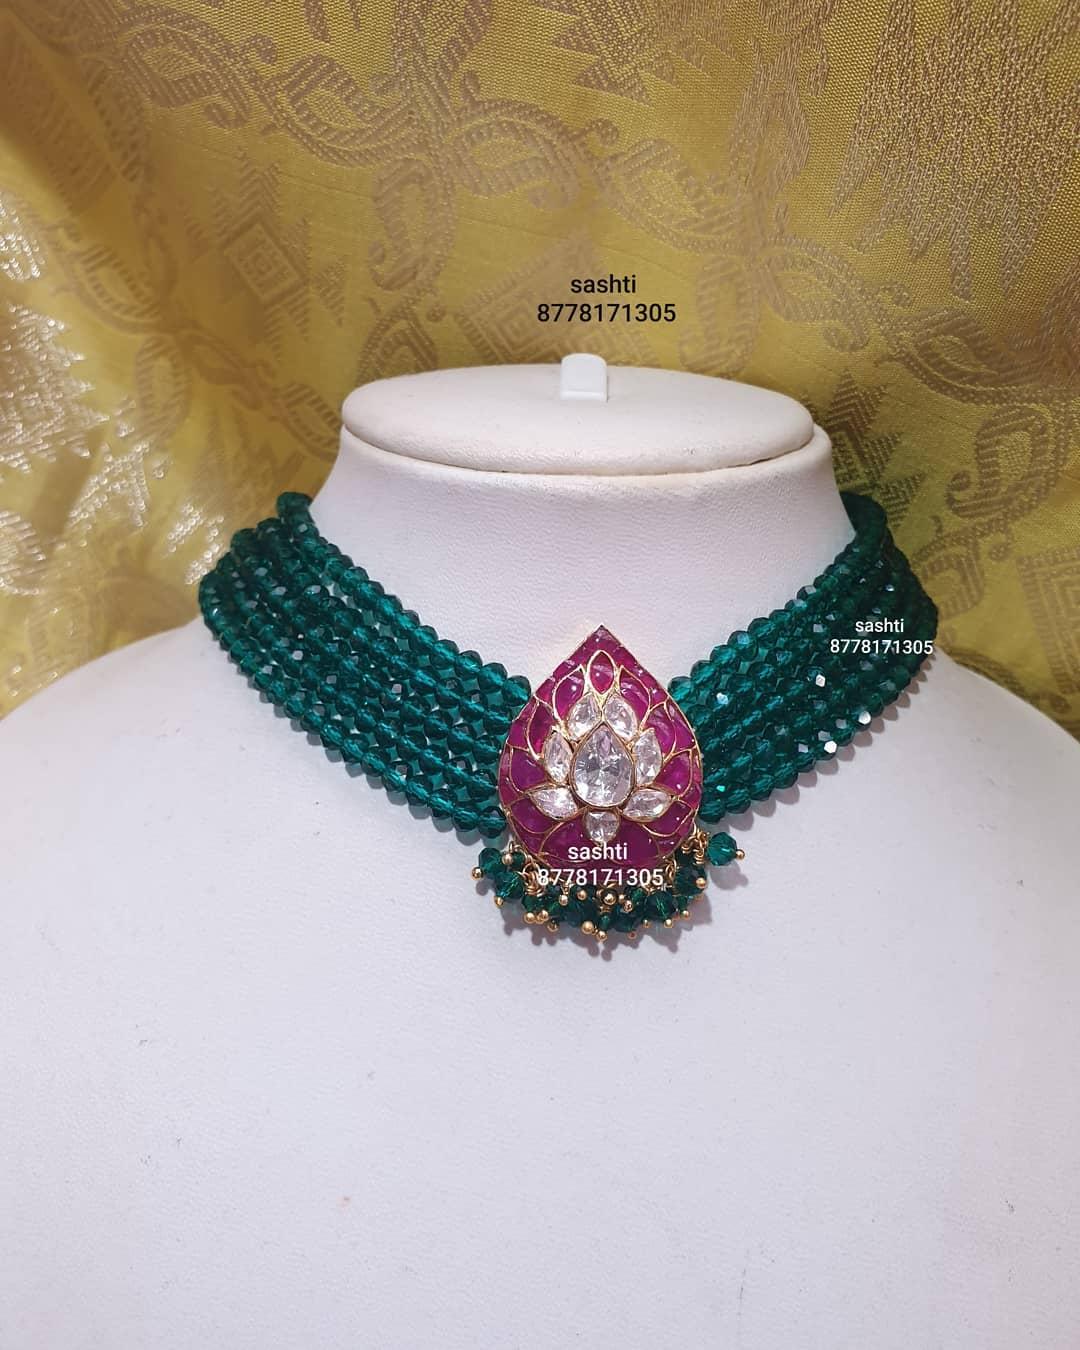 beads-choker-necklace